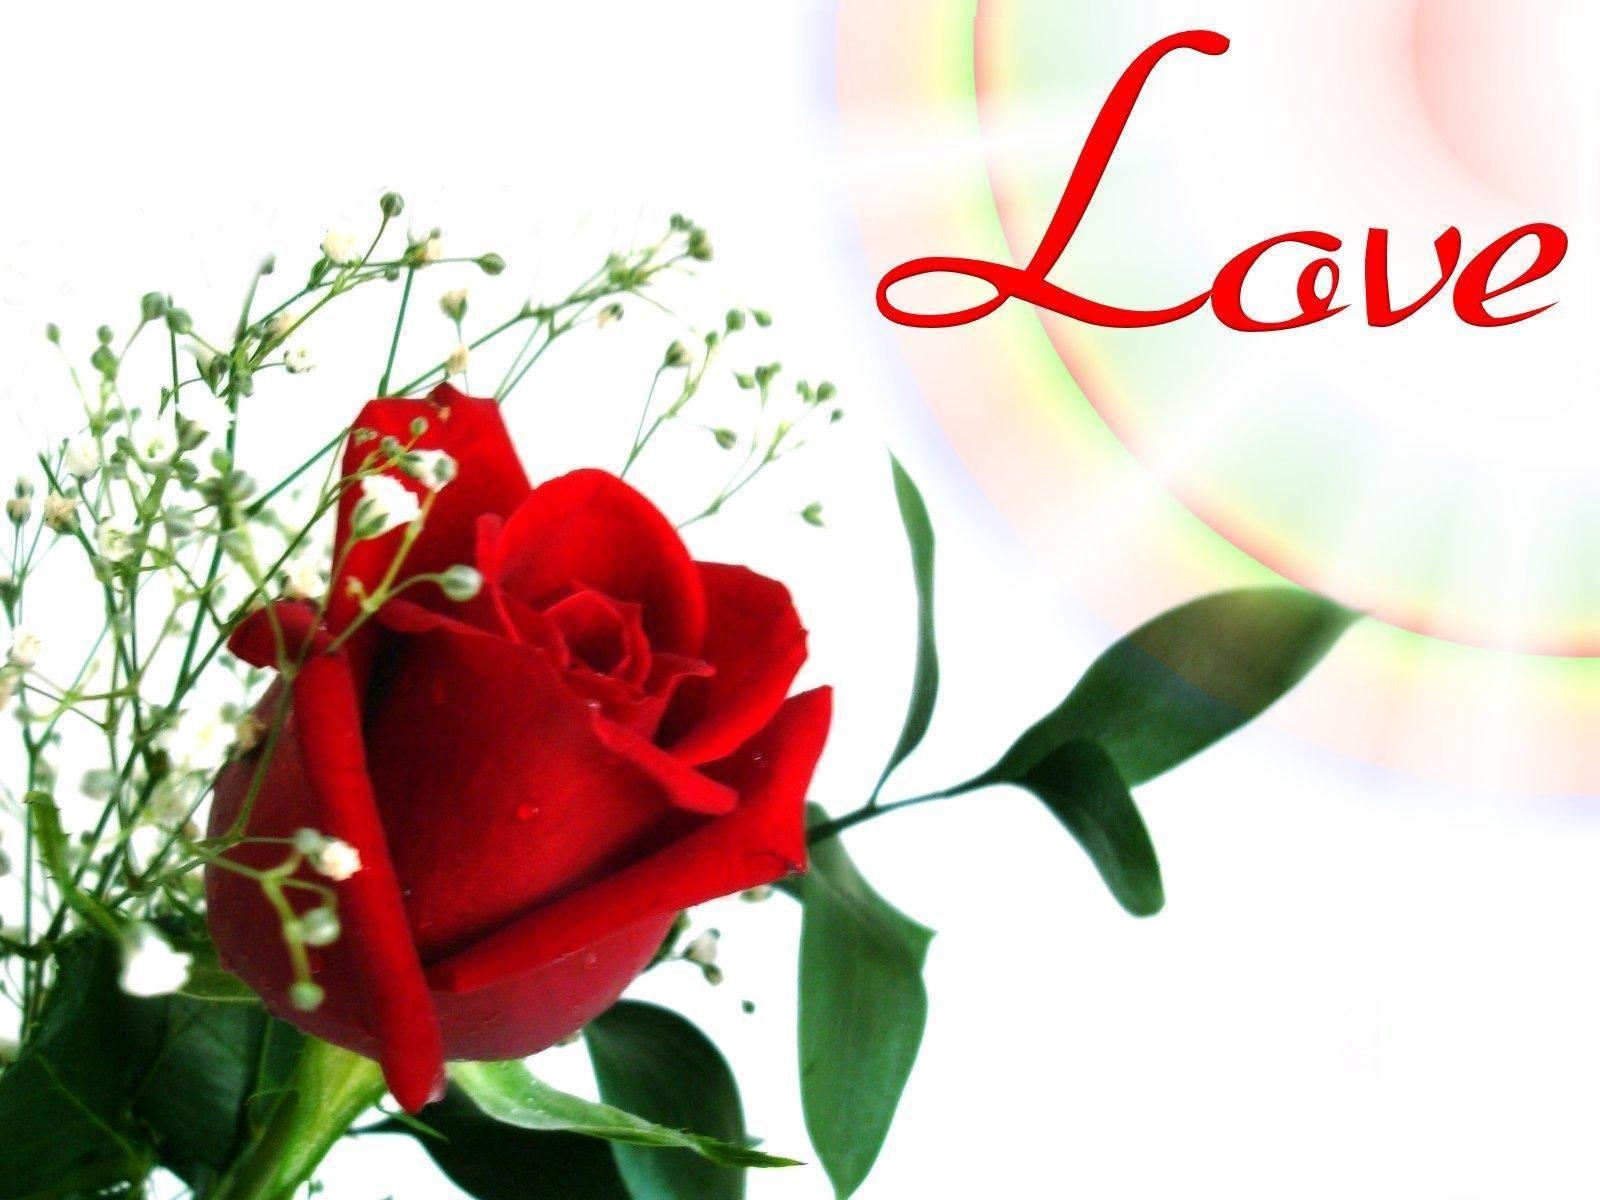 Pin By Mdhamid On Rahulkumar9878yahoo Gmail Com Red Flower Wallpaper Rose Flower Wallpaper Flower Wallpaper Love download rose flower wallpaper hd